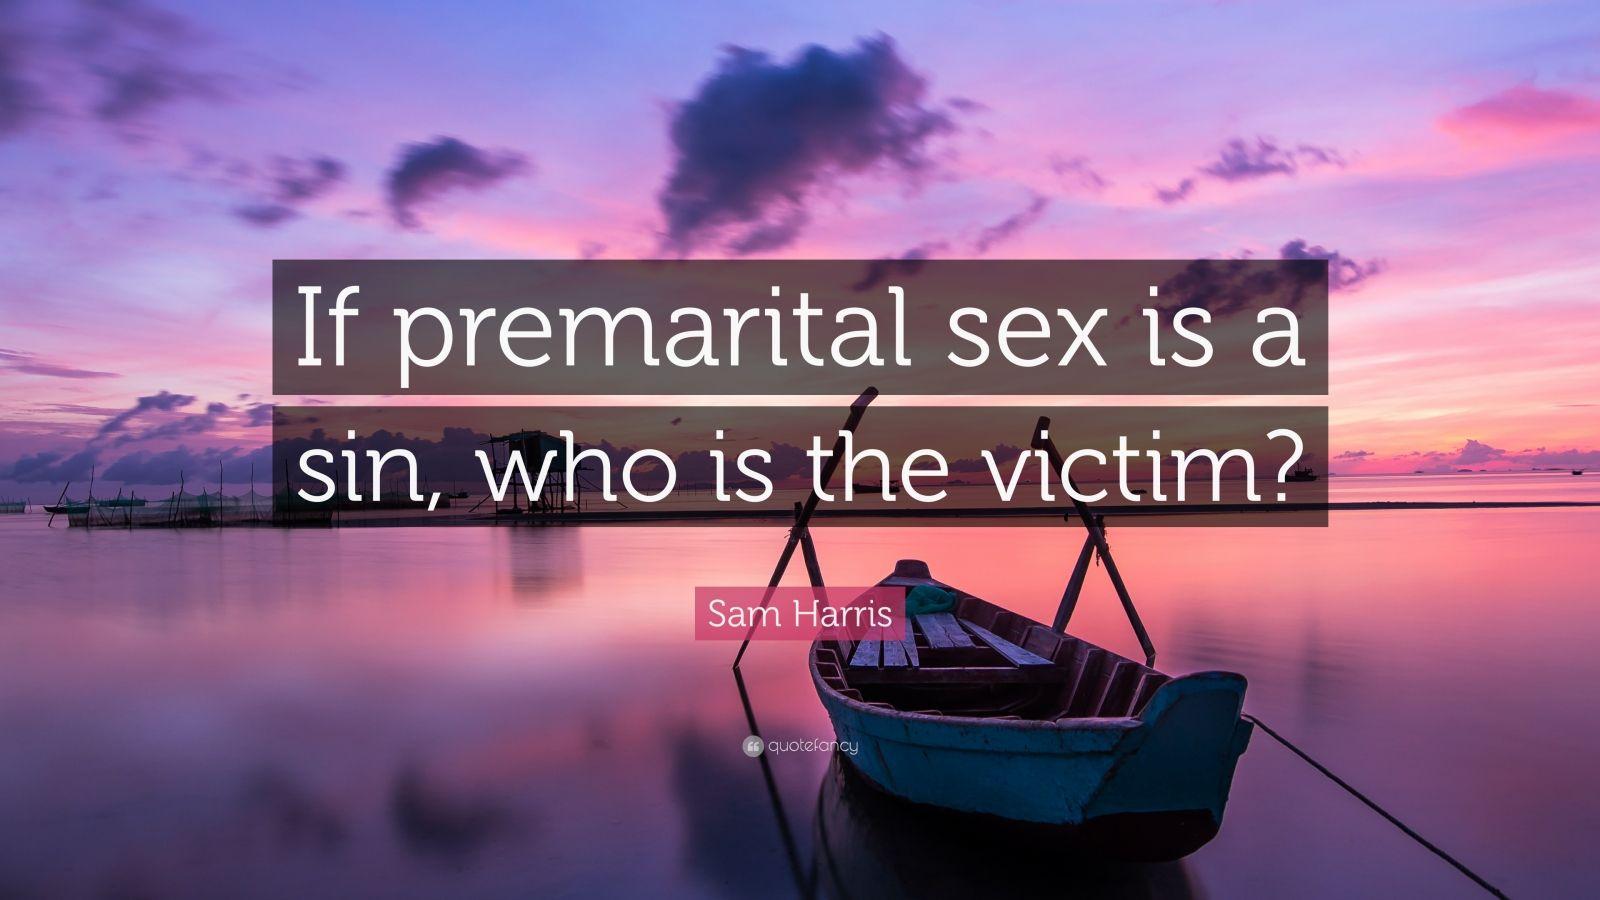 Premarital sex is a sin